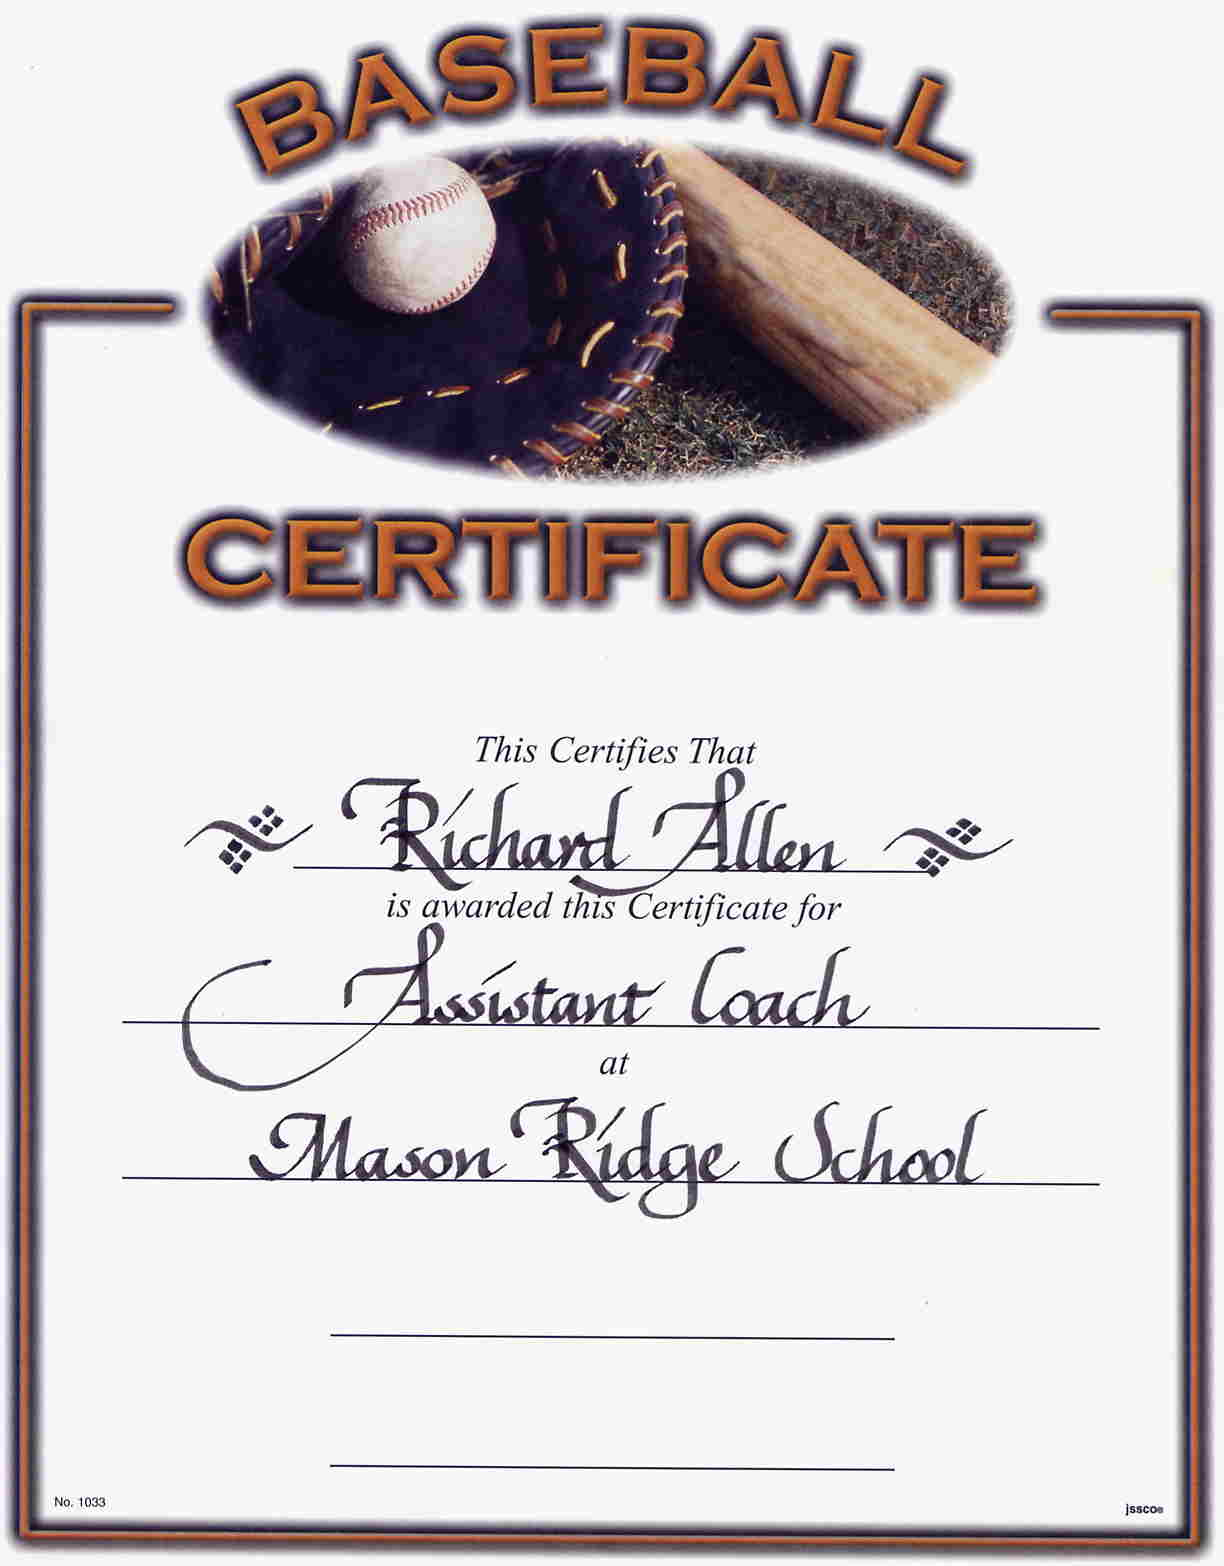 Printable Certificates For Baseball | Download Them Or Print - Free Printable Baseball Certificates